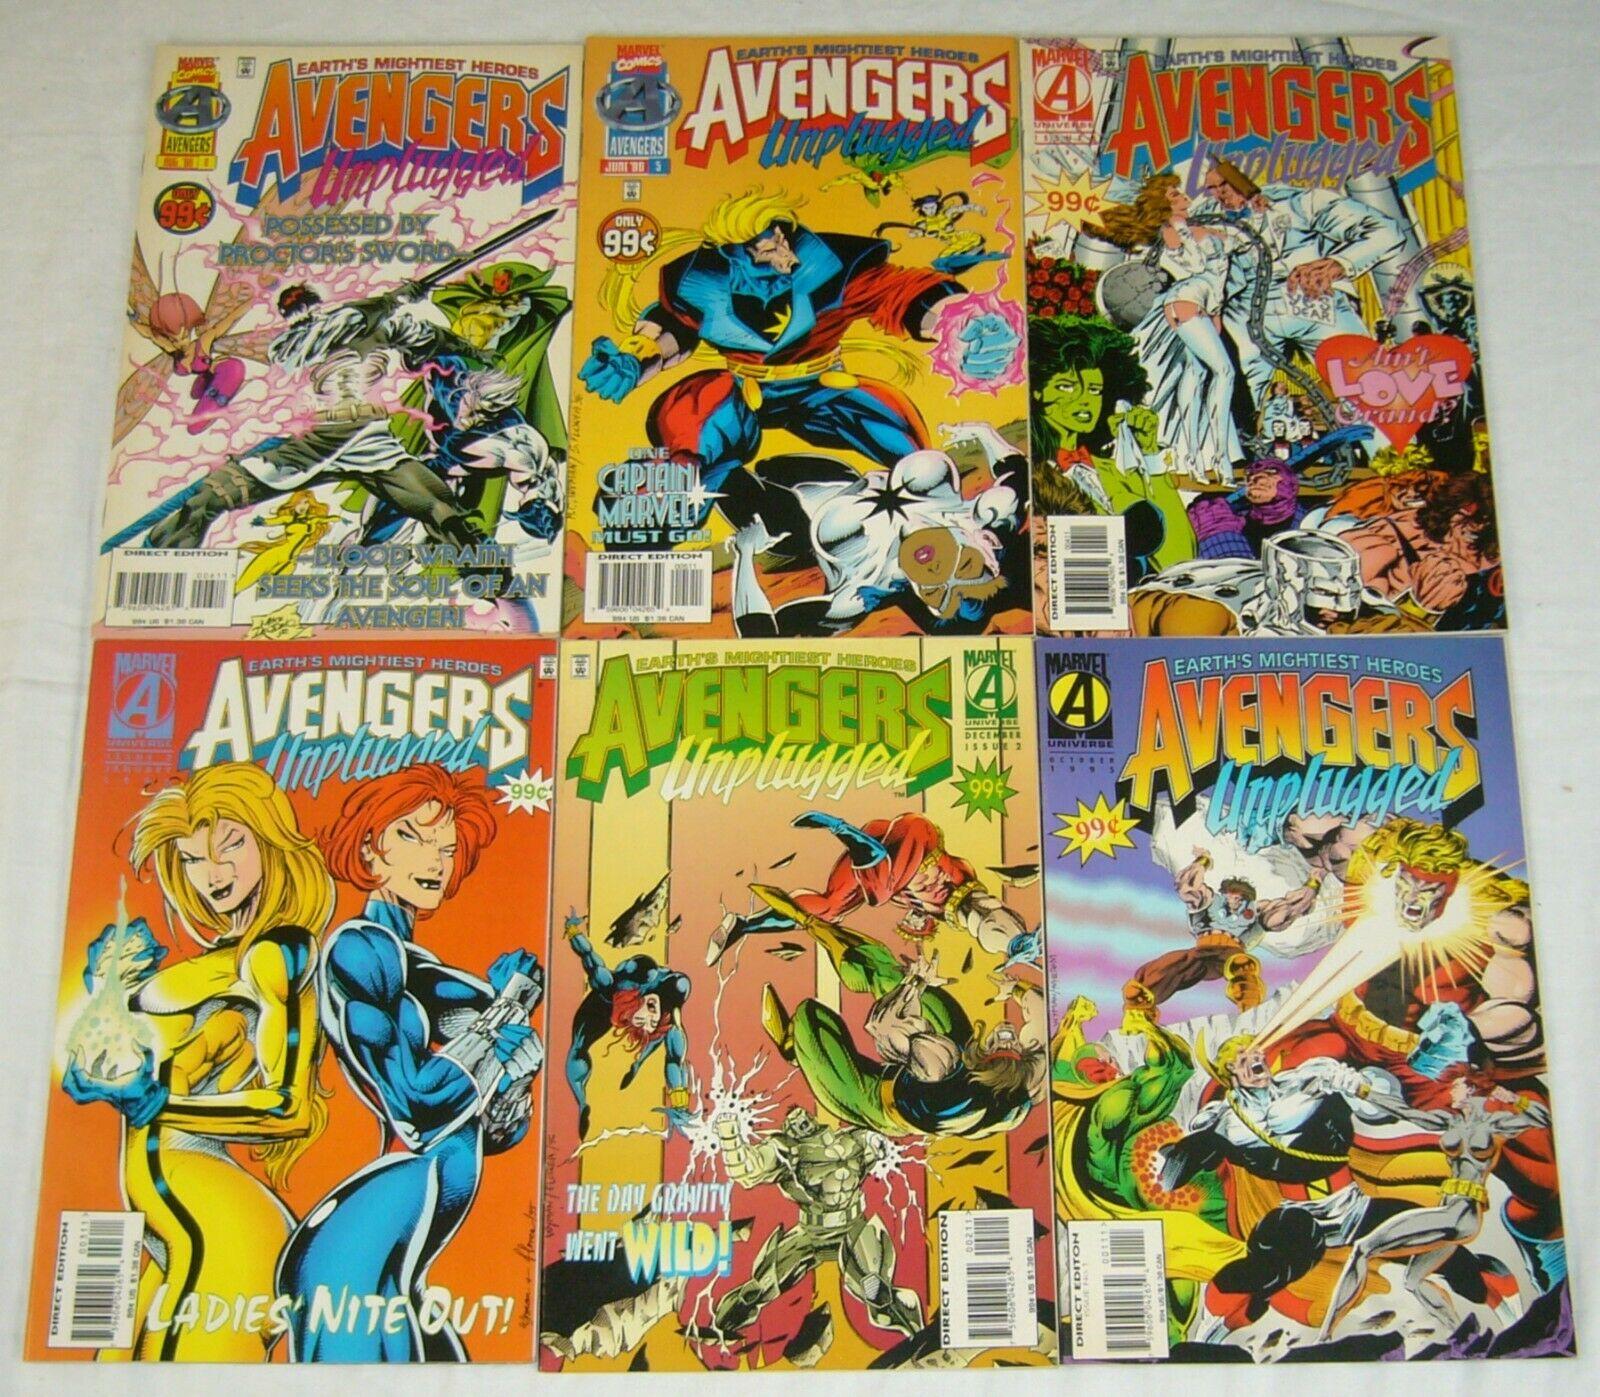 of 6 USA, 1995 Avengers Unplugged # 1